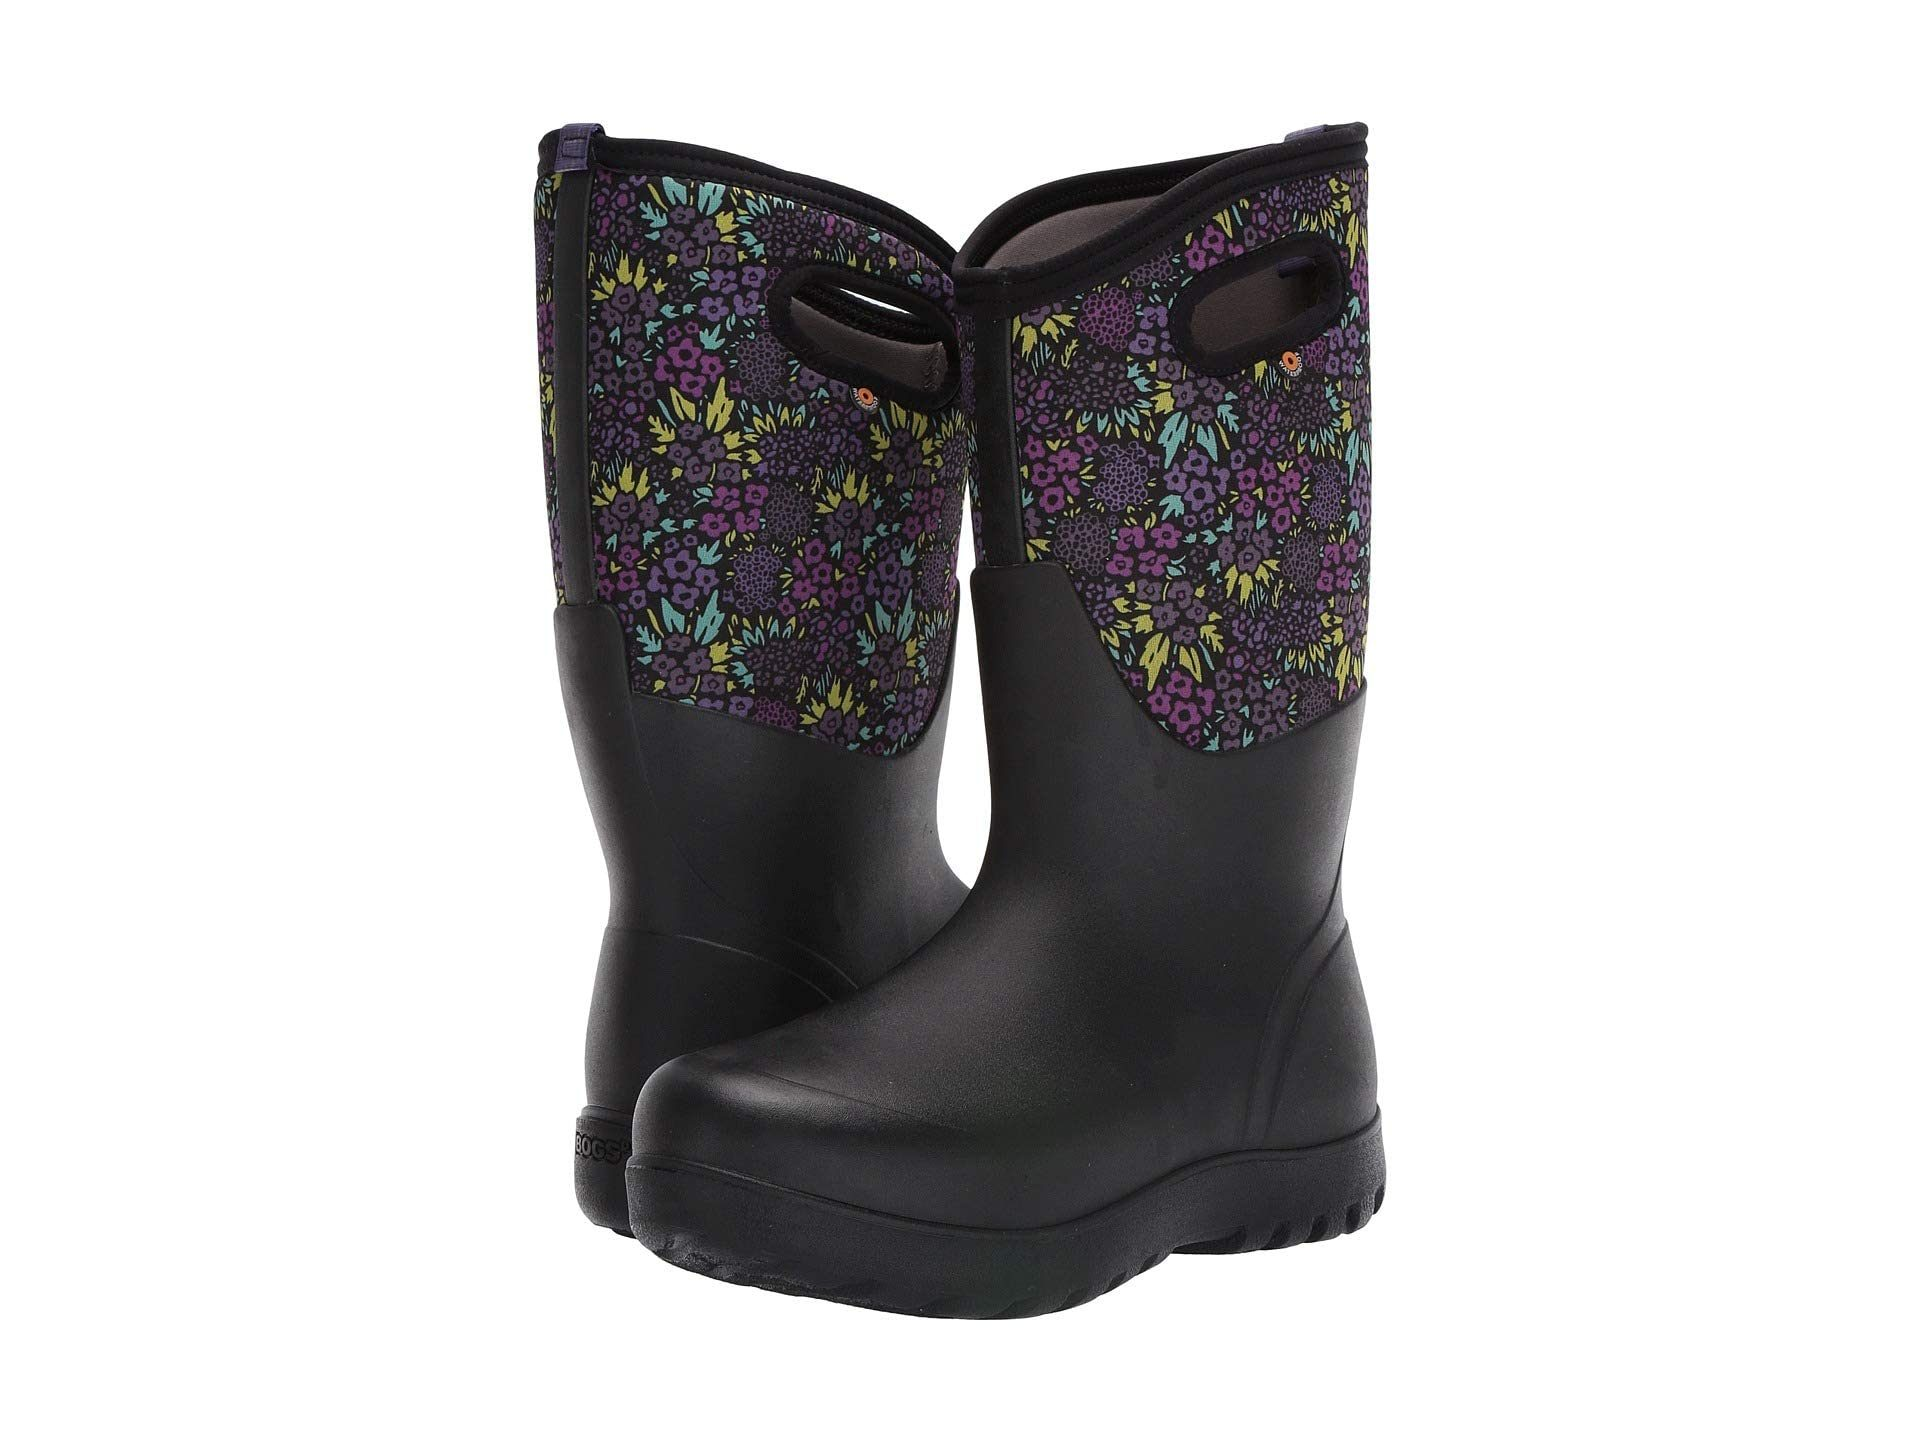 Bogs Neo-Classic NW Garden boot